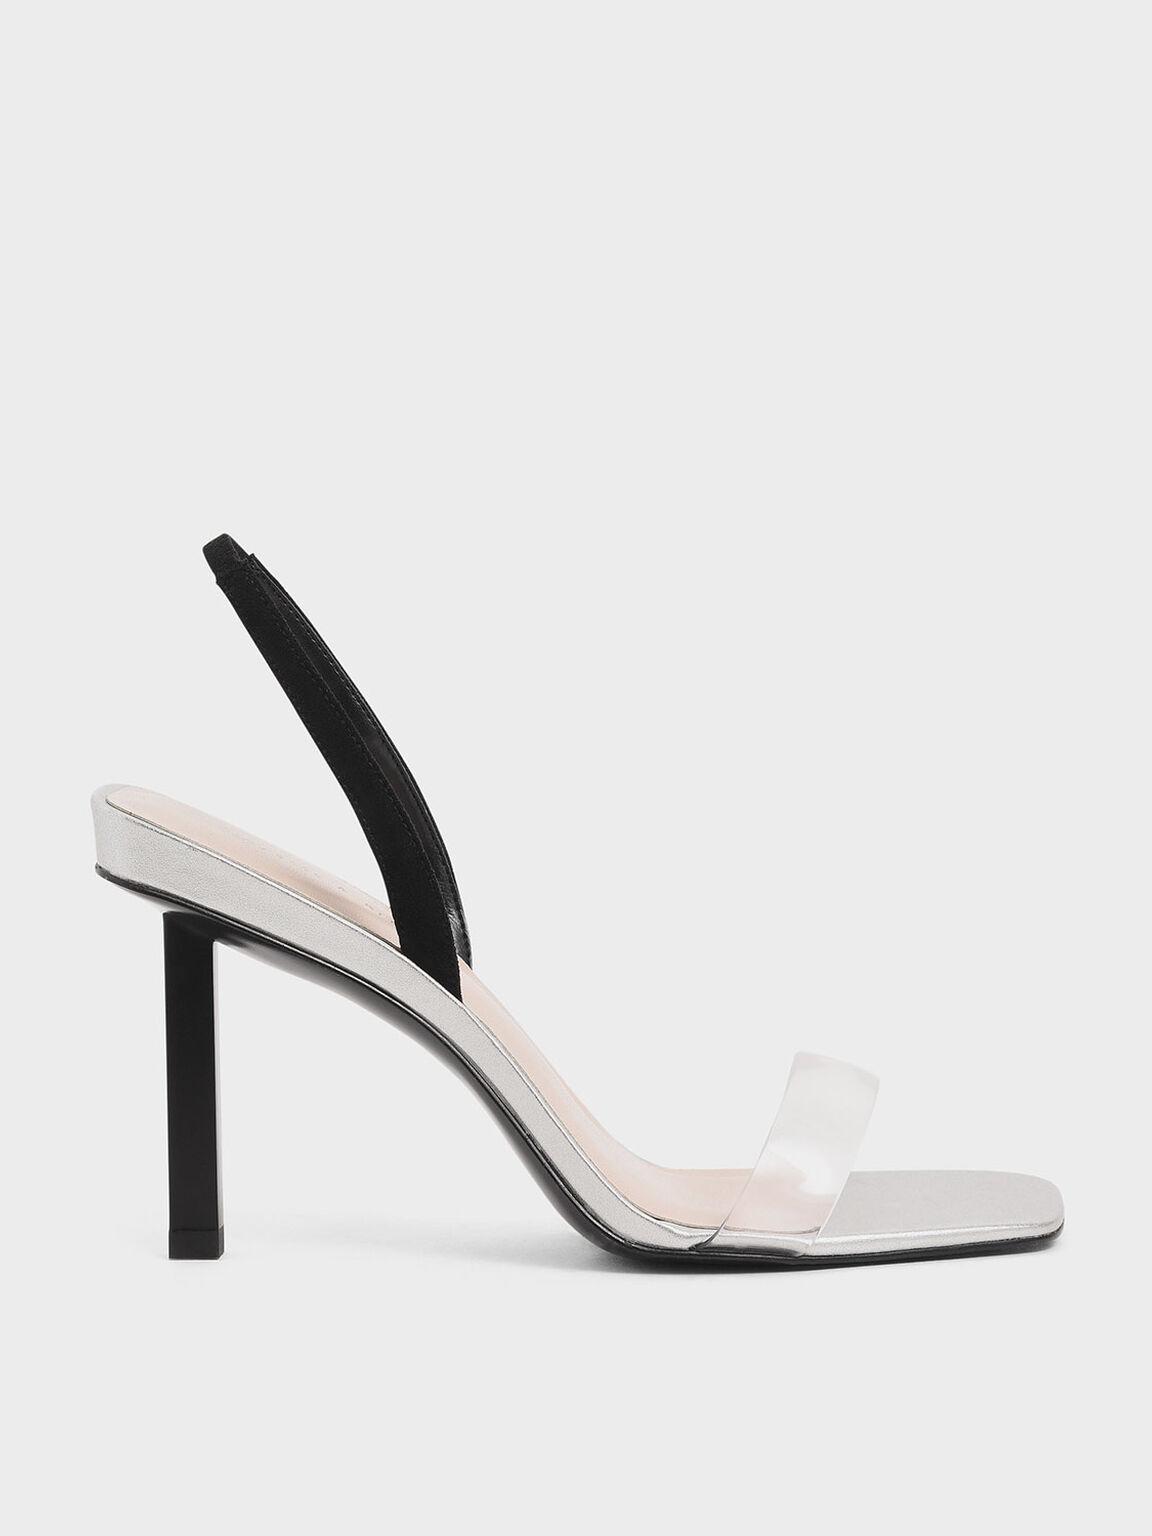 Nude Patent T-Bar Block Heel Sandals - CHARLES & KEITH UK